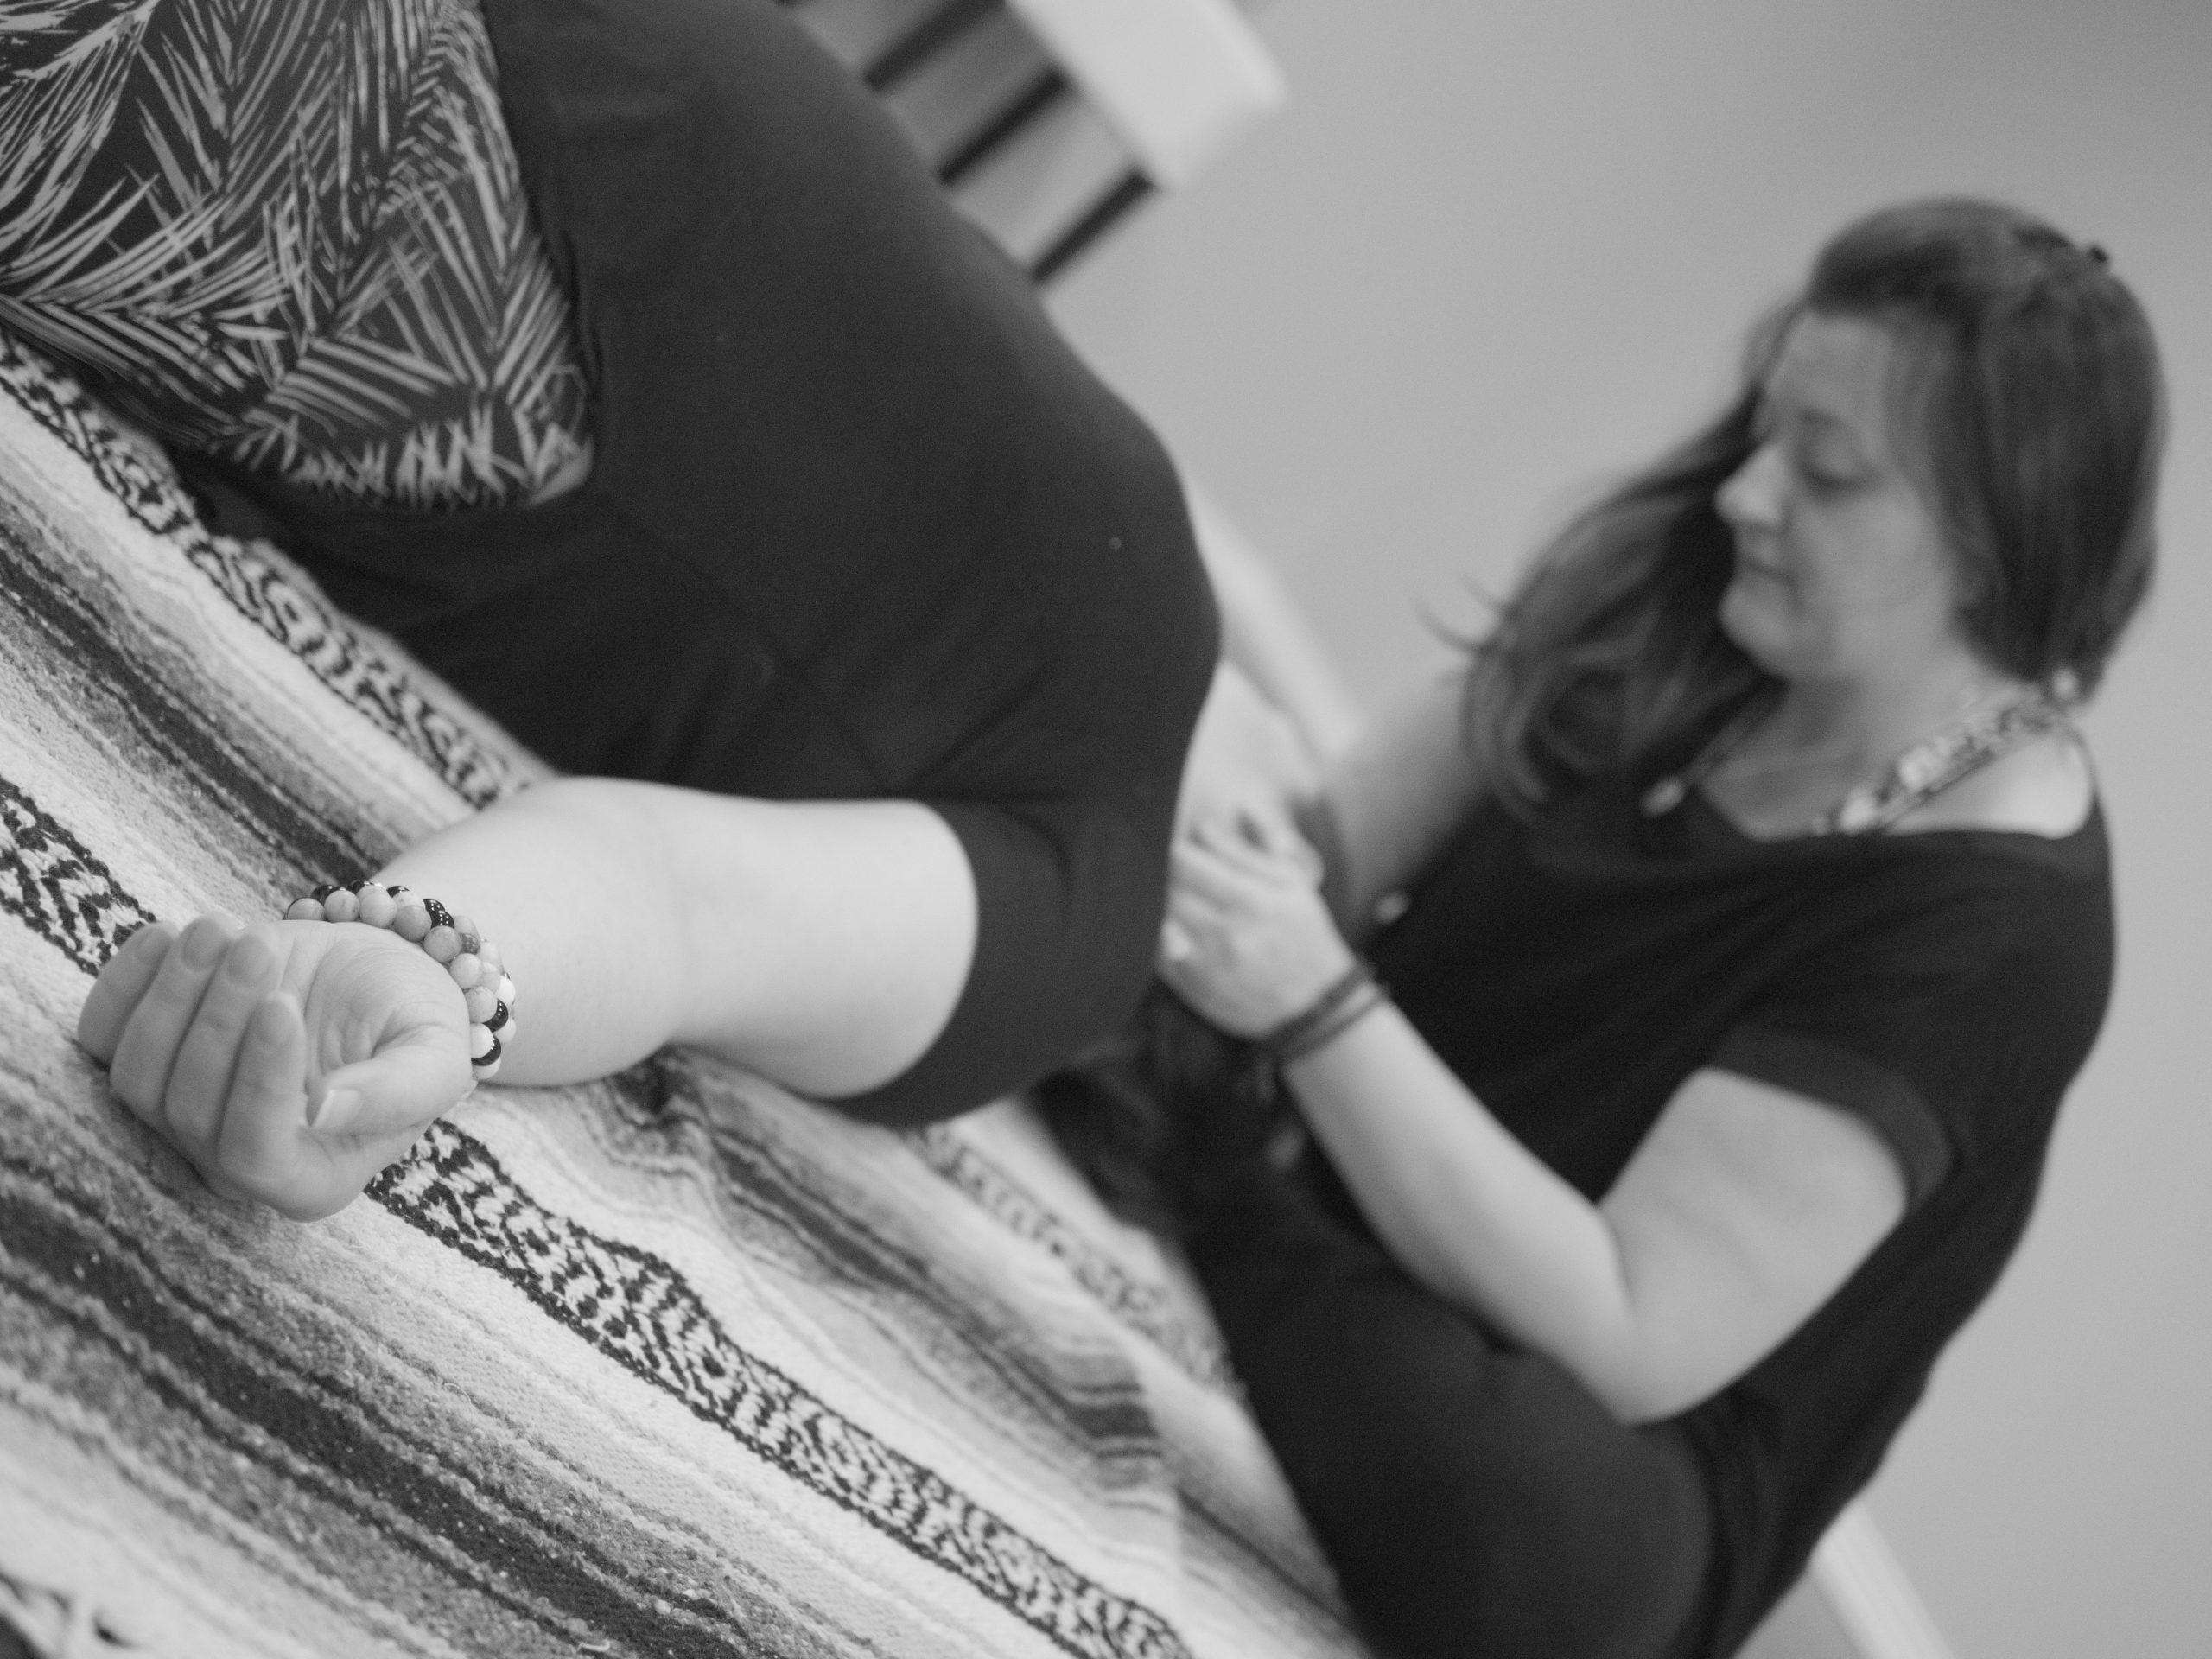 Life of Wellness Institute - ViniYoga Teacher Training with Yoga Therapist Melanie Taylor